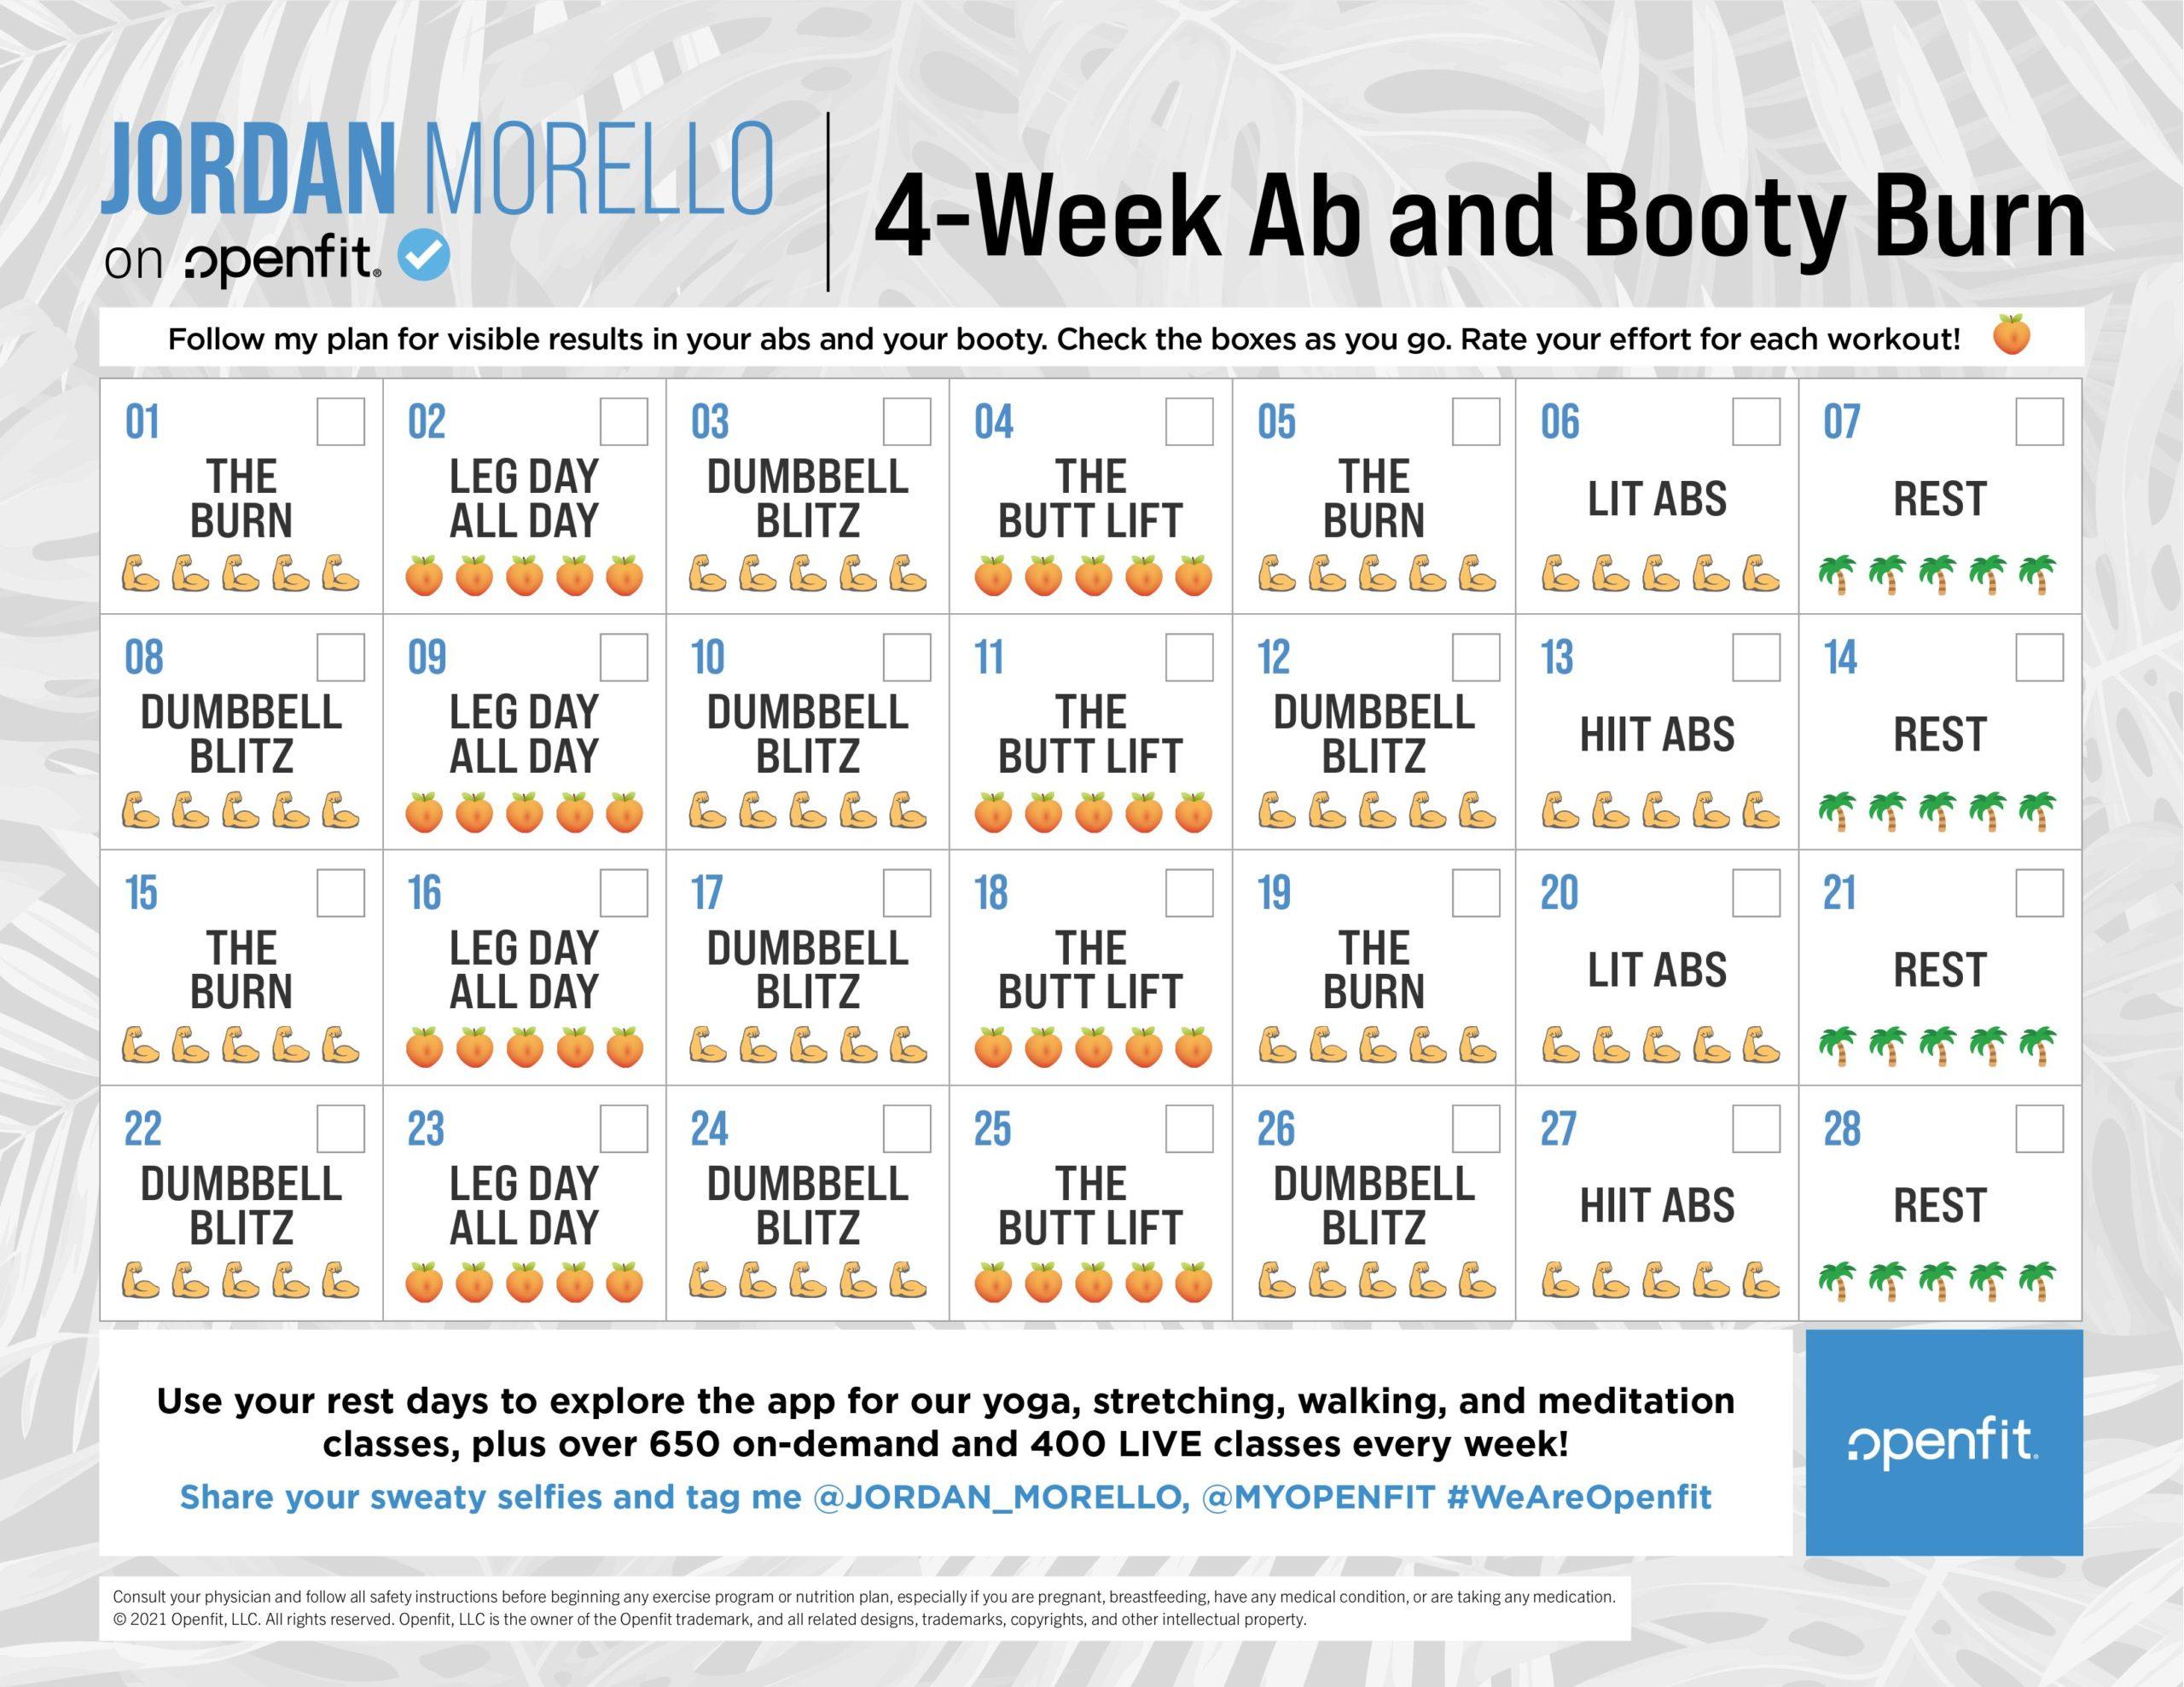 4 week jordan morello calendar